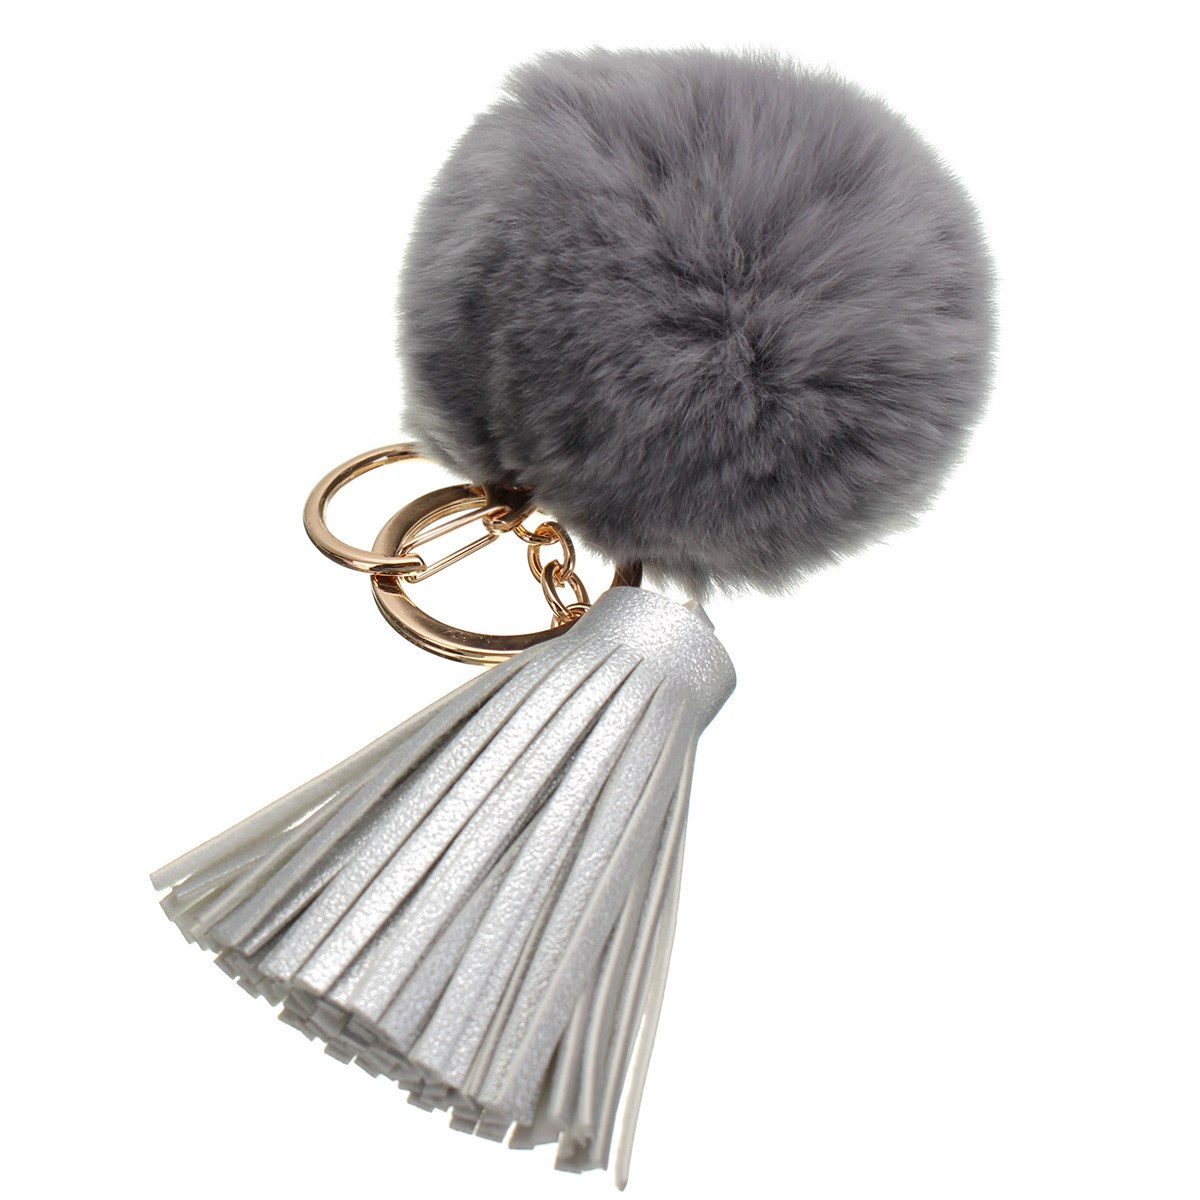 8CM Beaver Rabbit Fur Ball Bags Pendant Fashion Cute Bag Accessories Girl Handbag Decoration Tassel Accessories Parts Fringe playful chasing and rolling beaver ball 2 aa